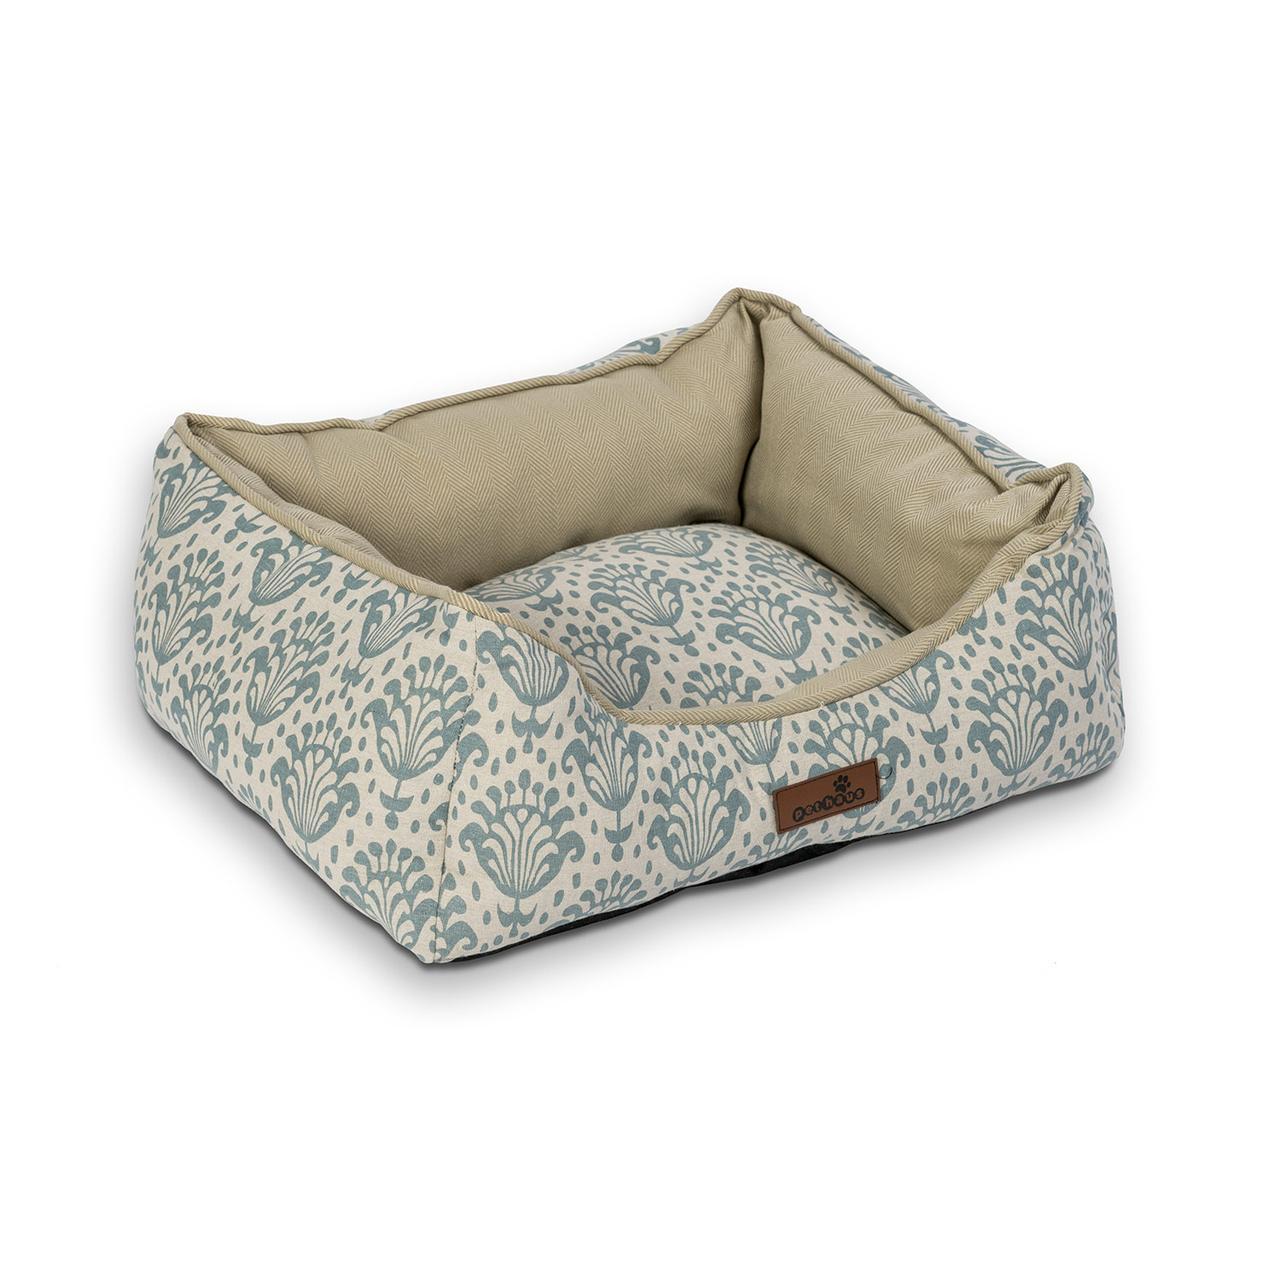 Манеж кровать кошка собака 62x53см размер M